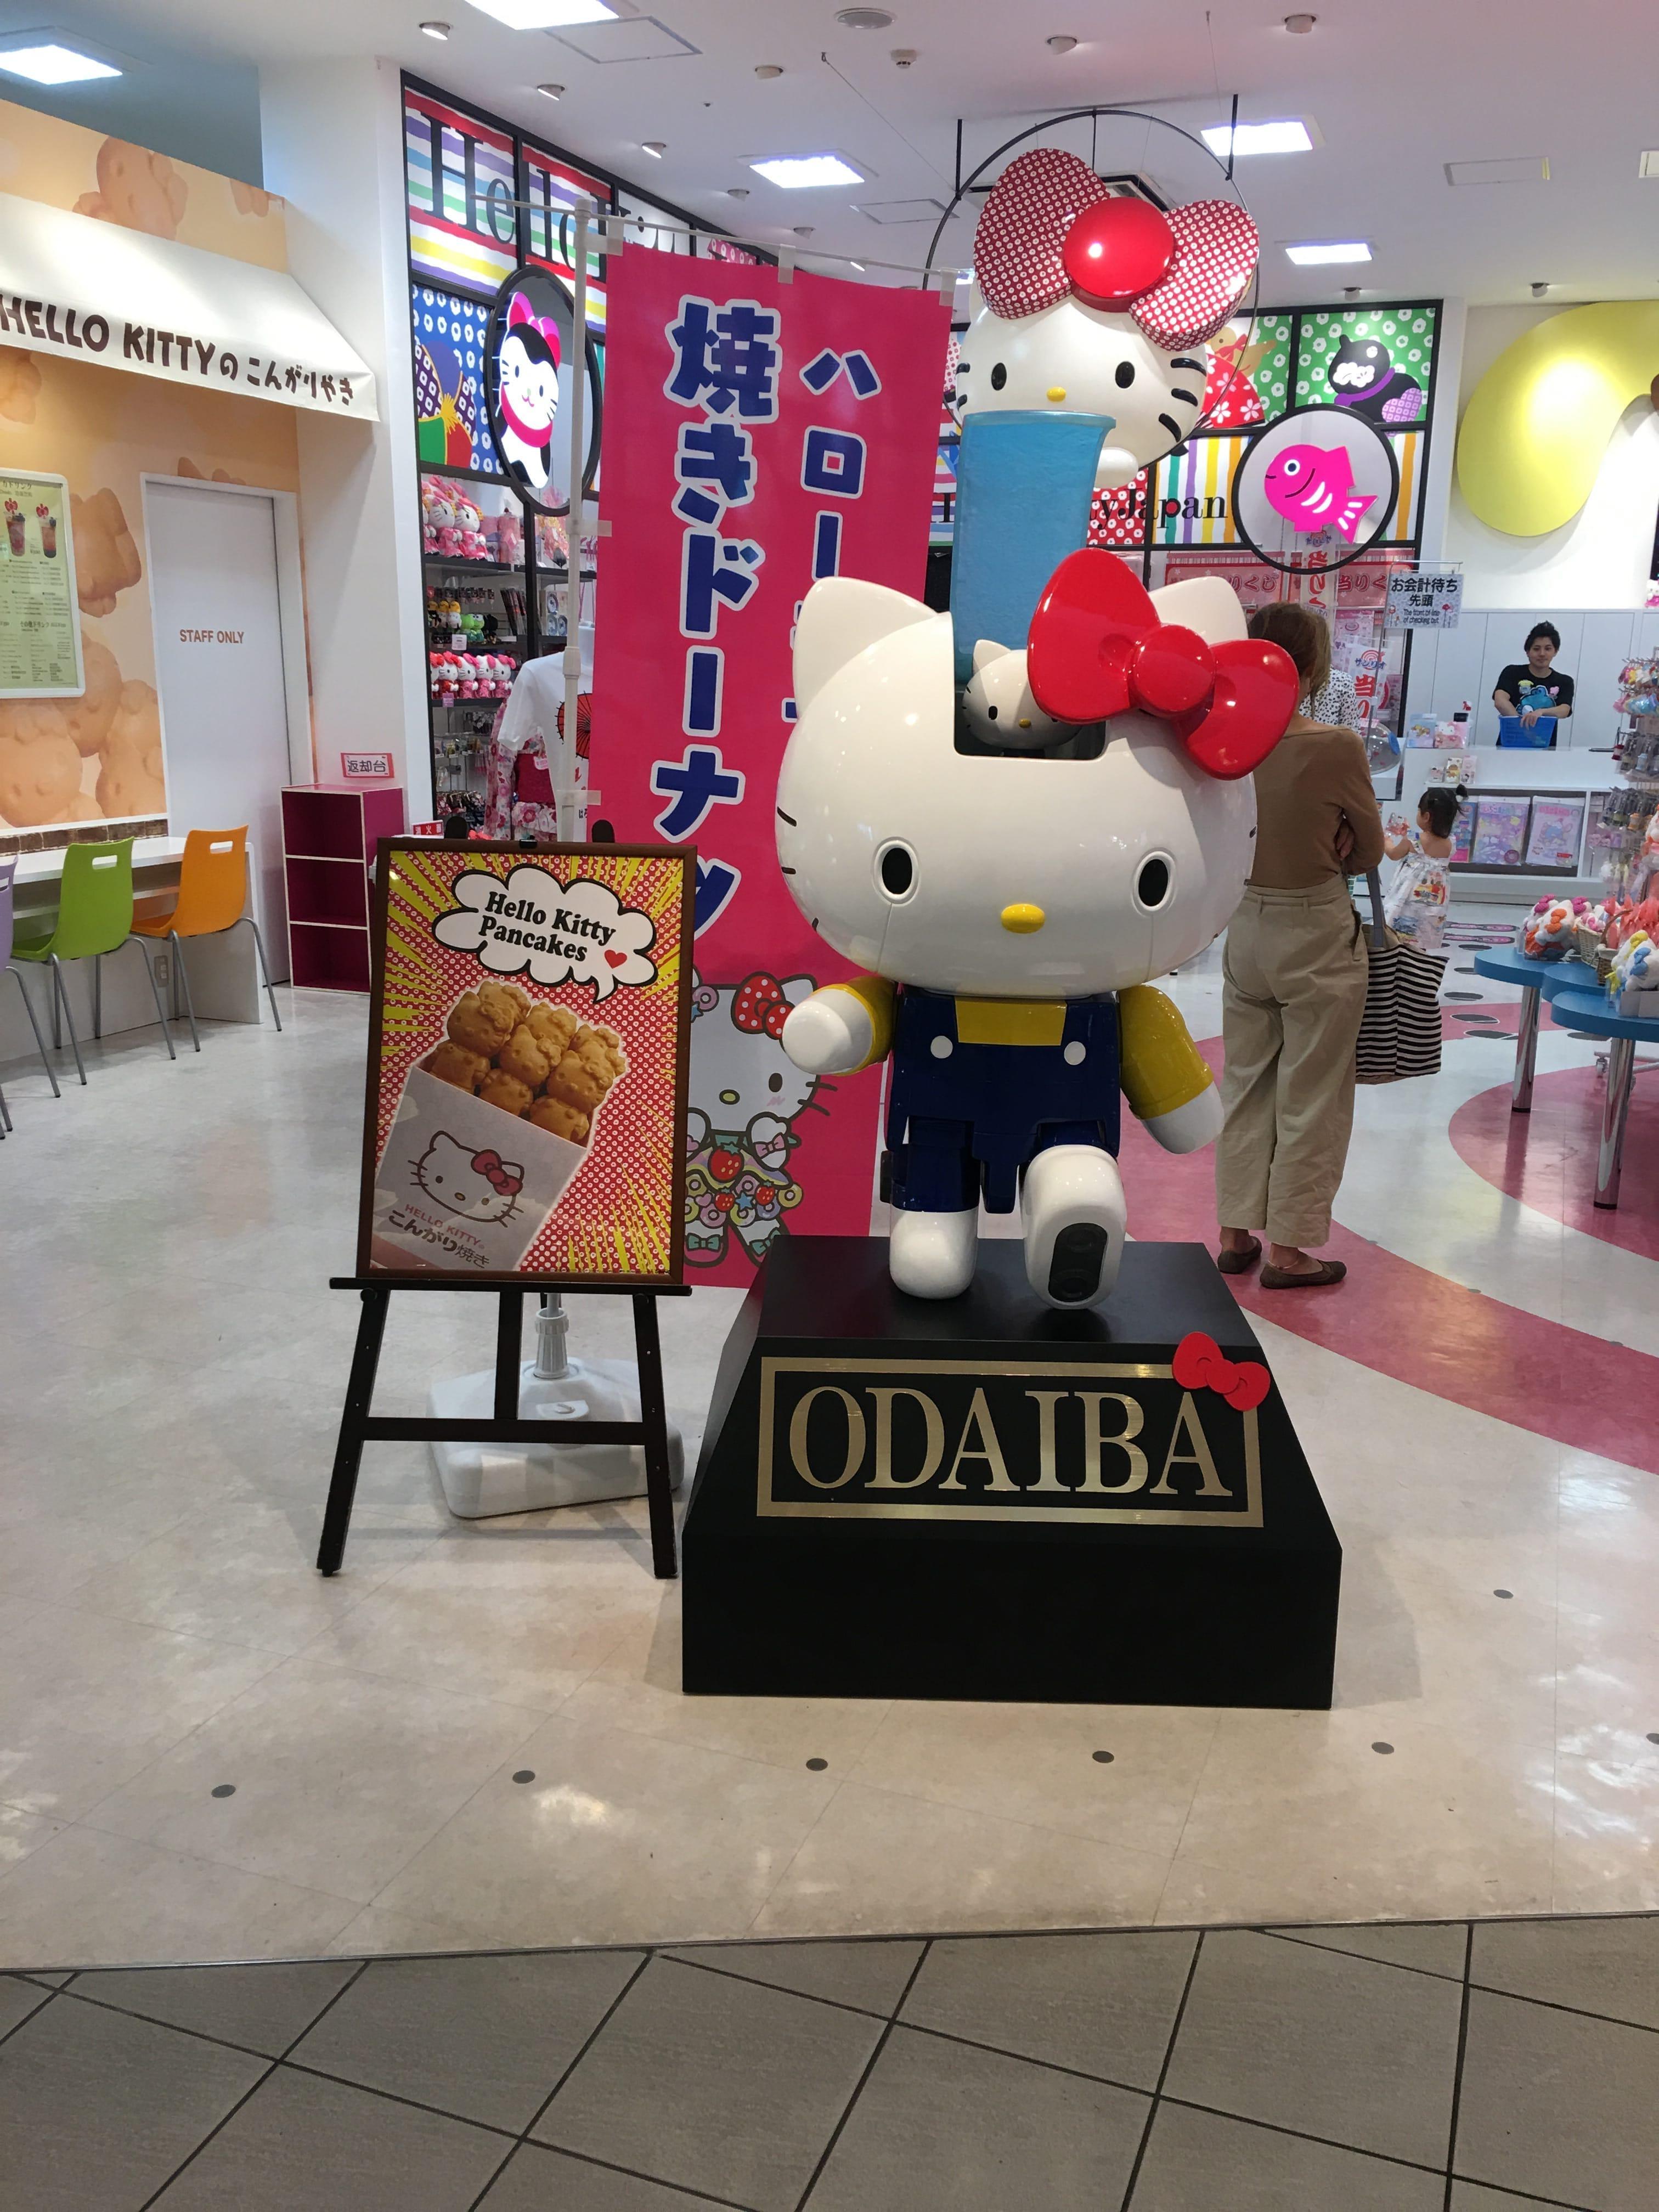 Hello Kitty Japan In Odaiba